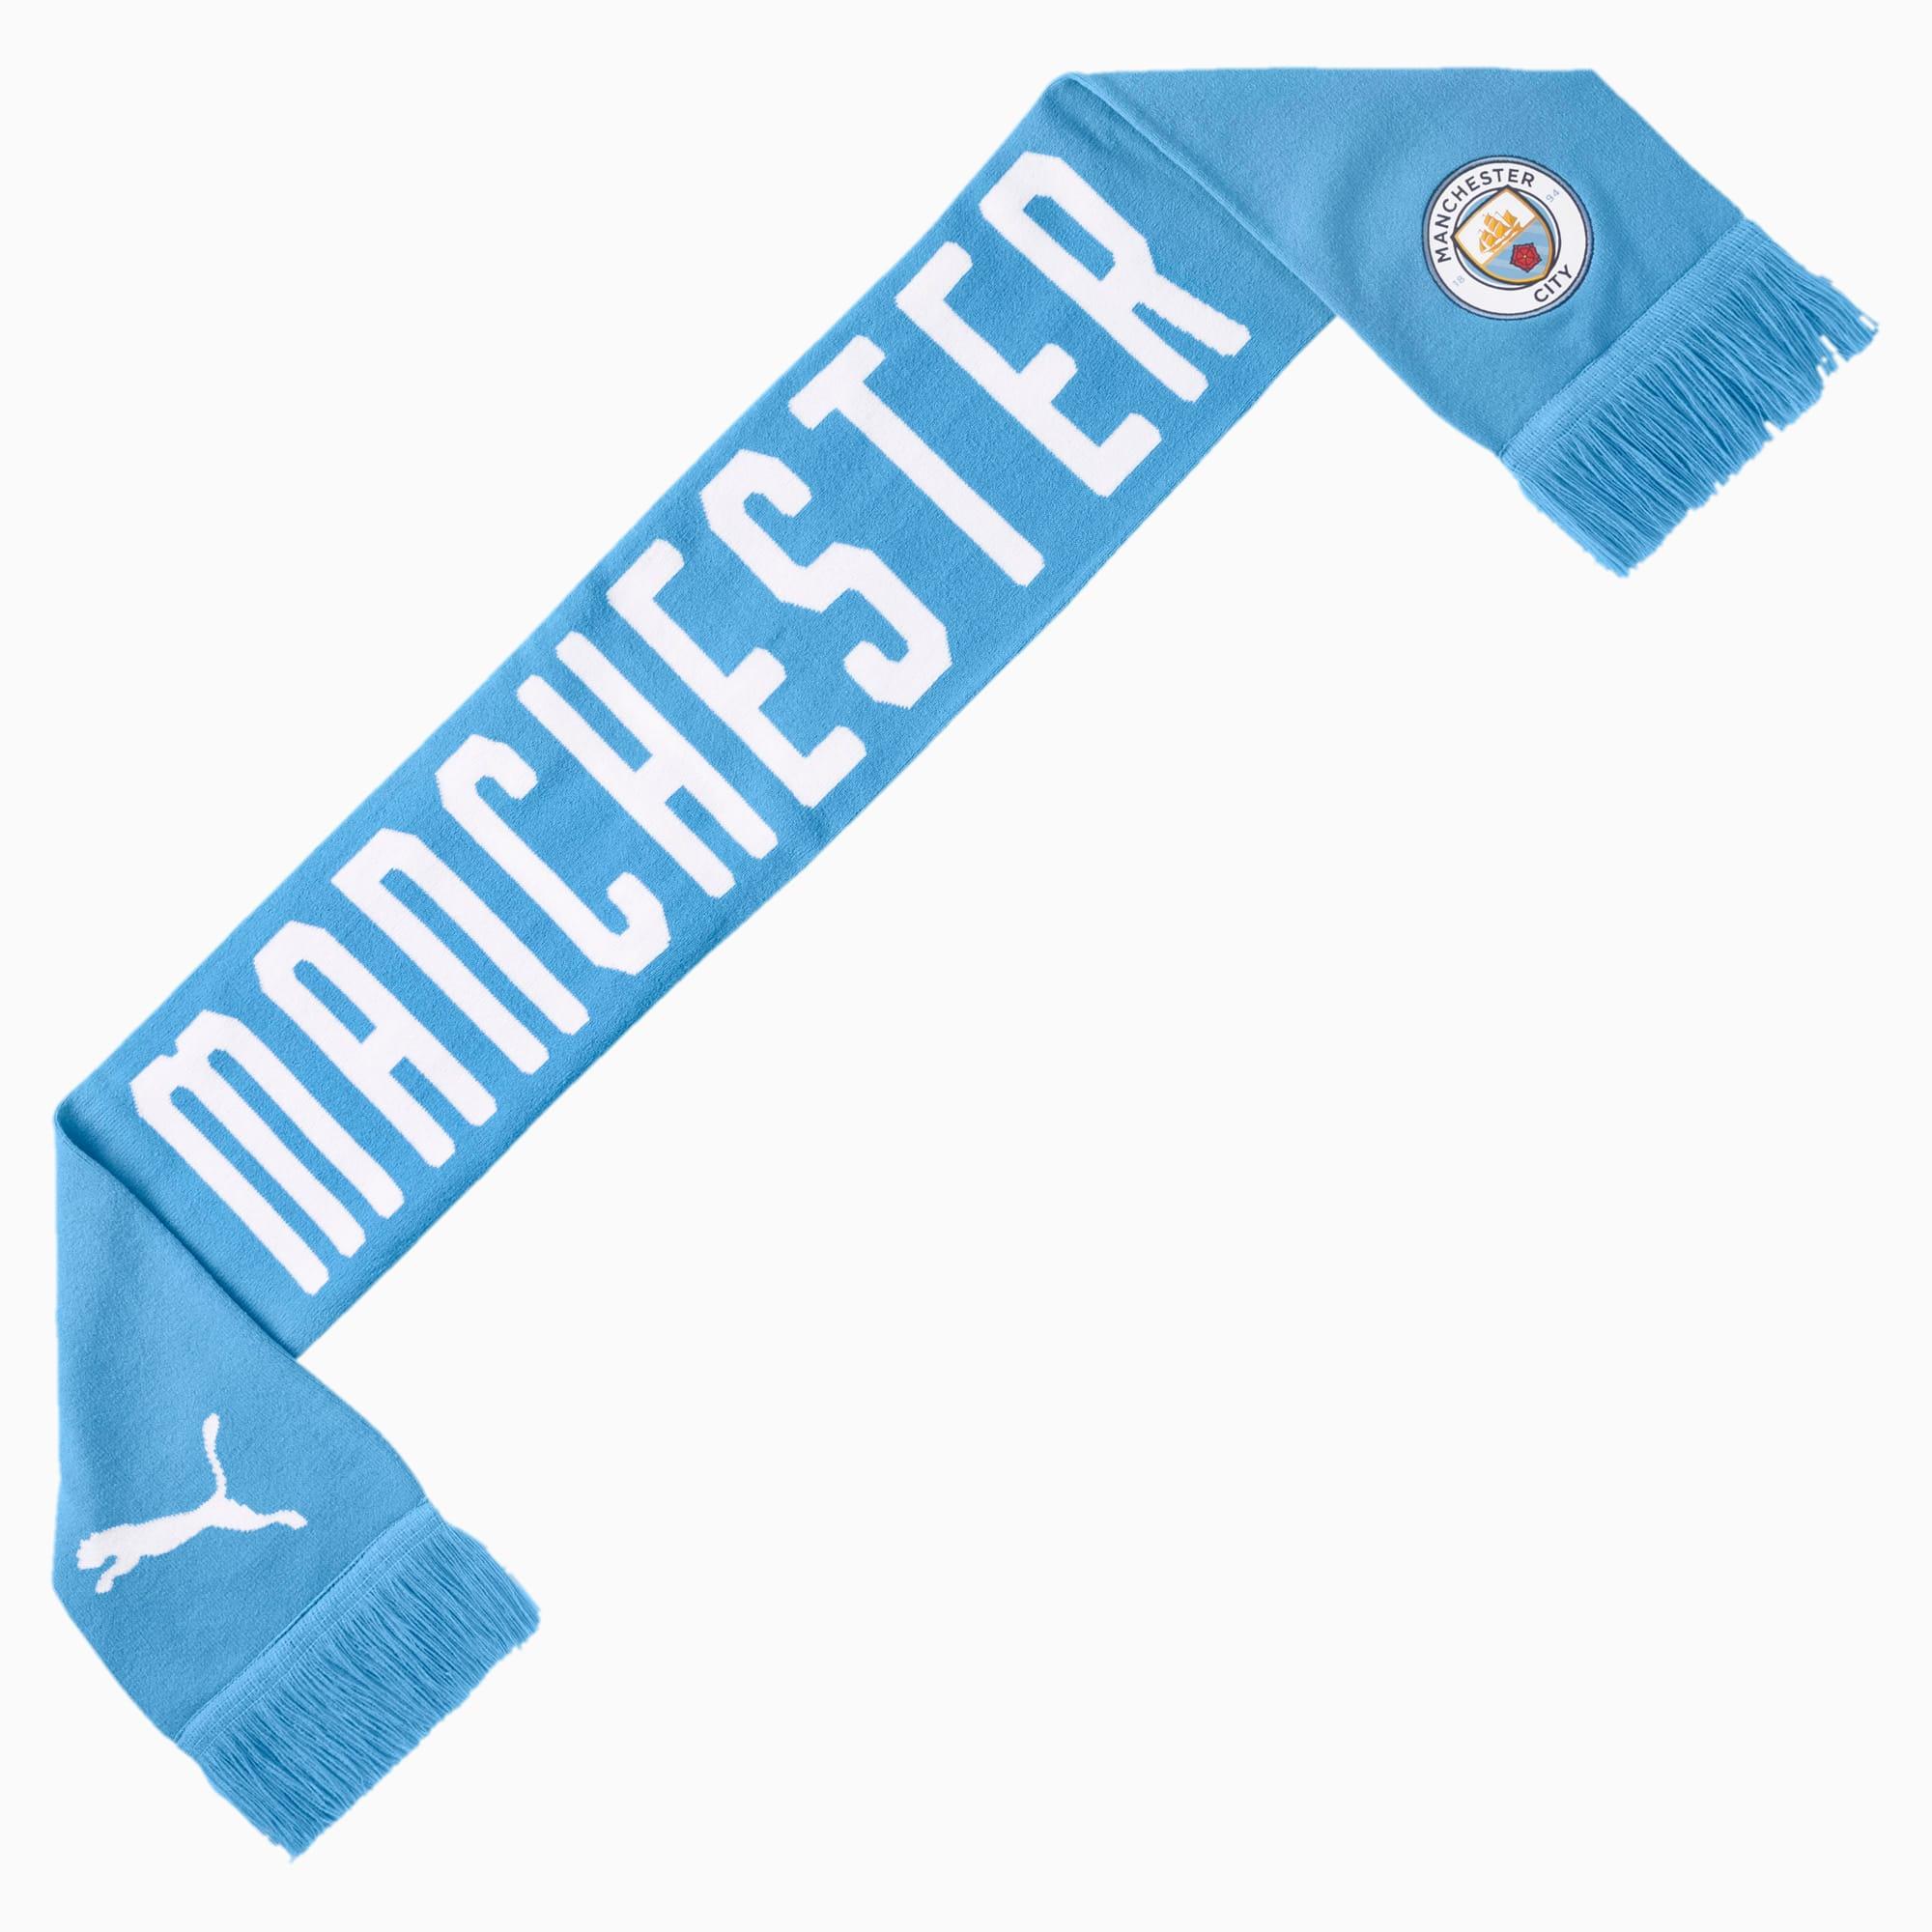 Écharpe manchester city fc dna fan, bleu/blanc, vêtements